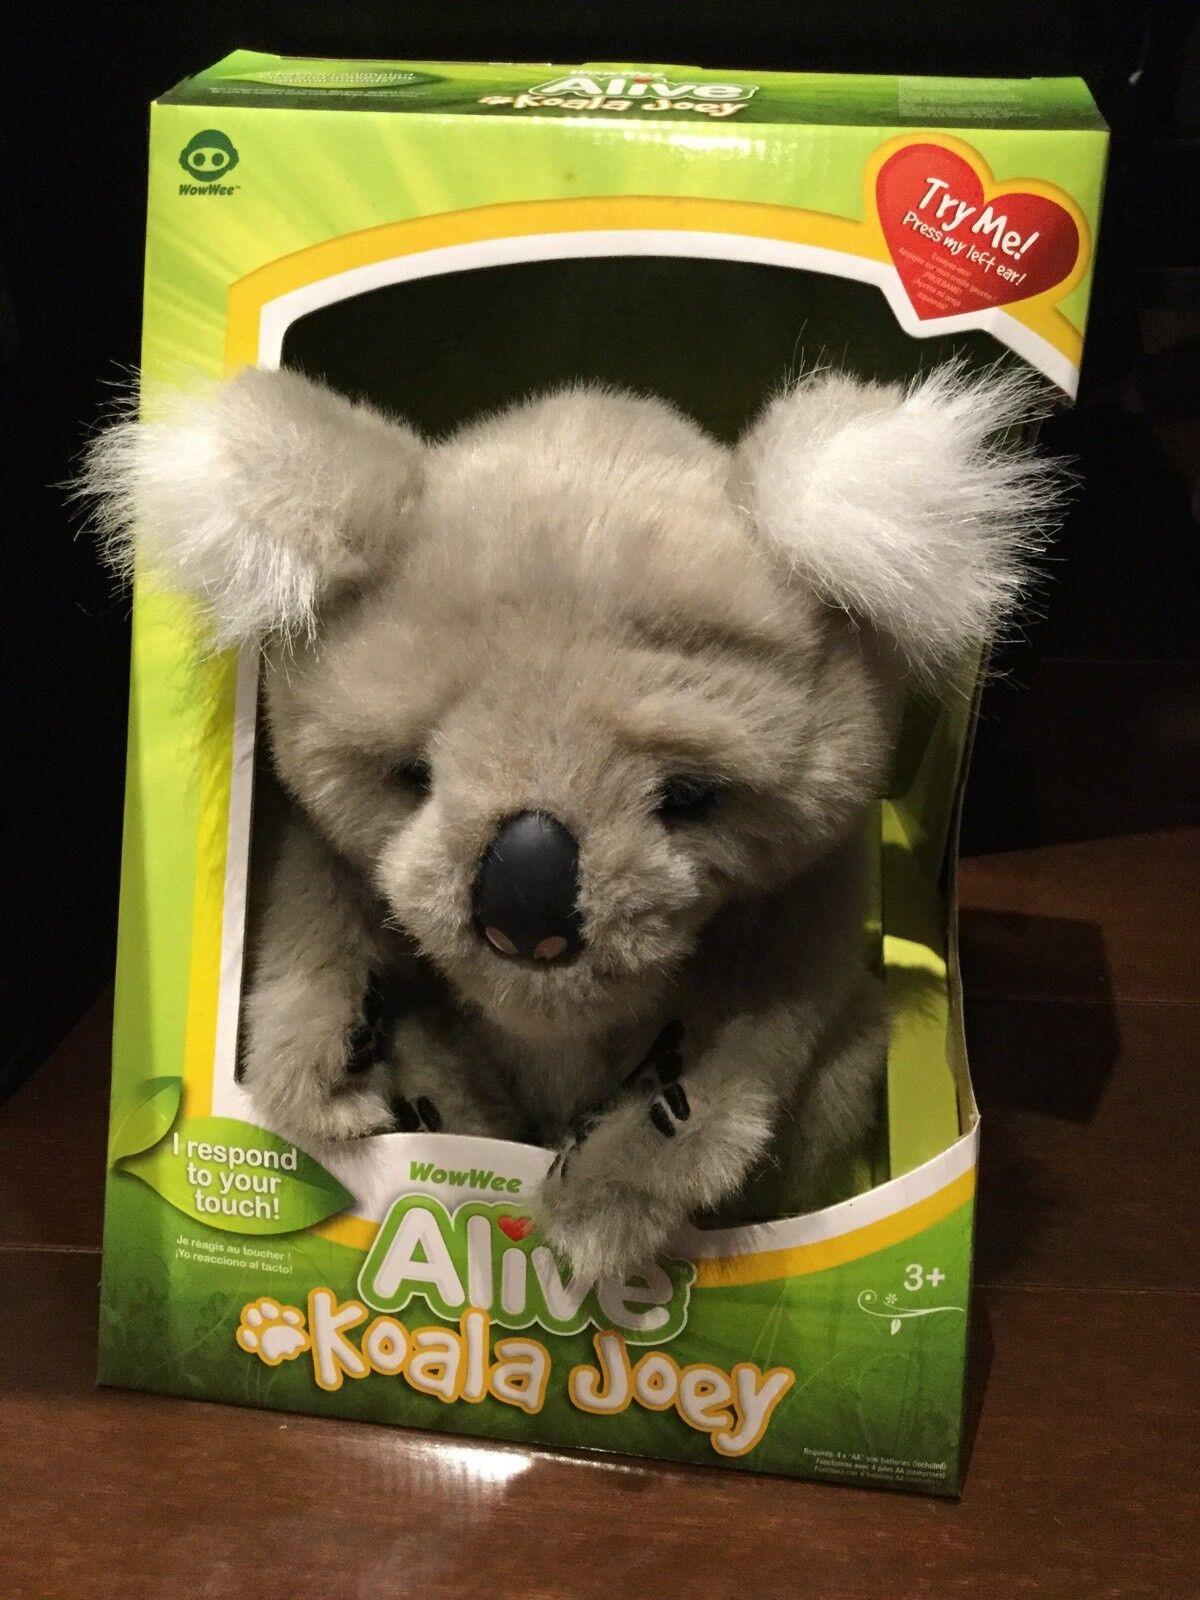 ALIVE KOALA JOEY WOWWEE BRAND NEW IN BOX